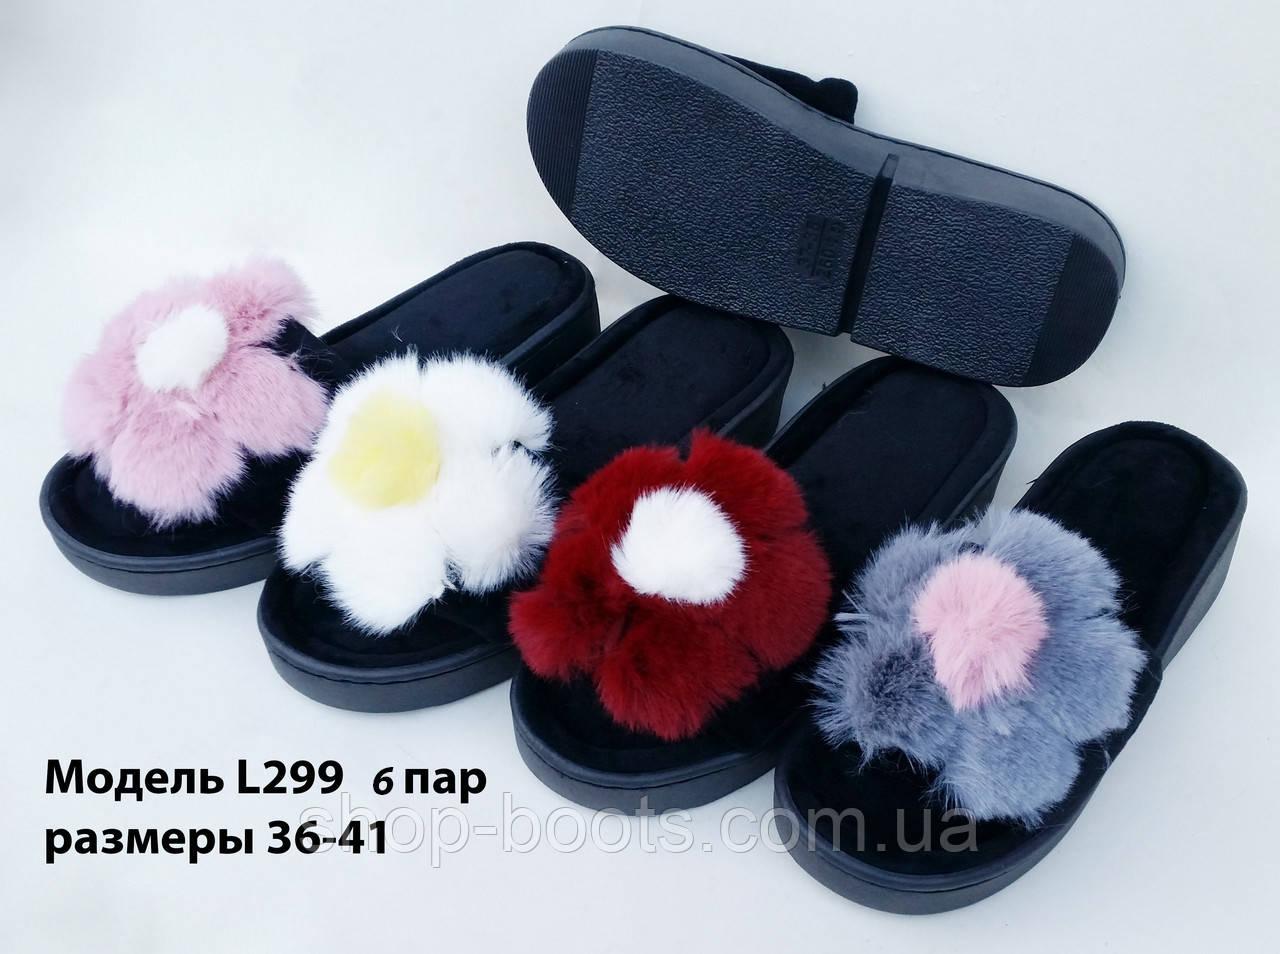 Женские тапочки оптом. 36-41рр. Модель тапочки L299